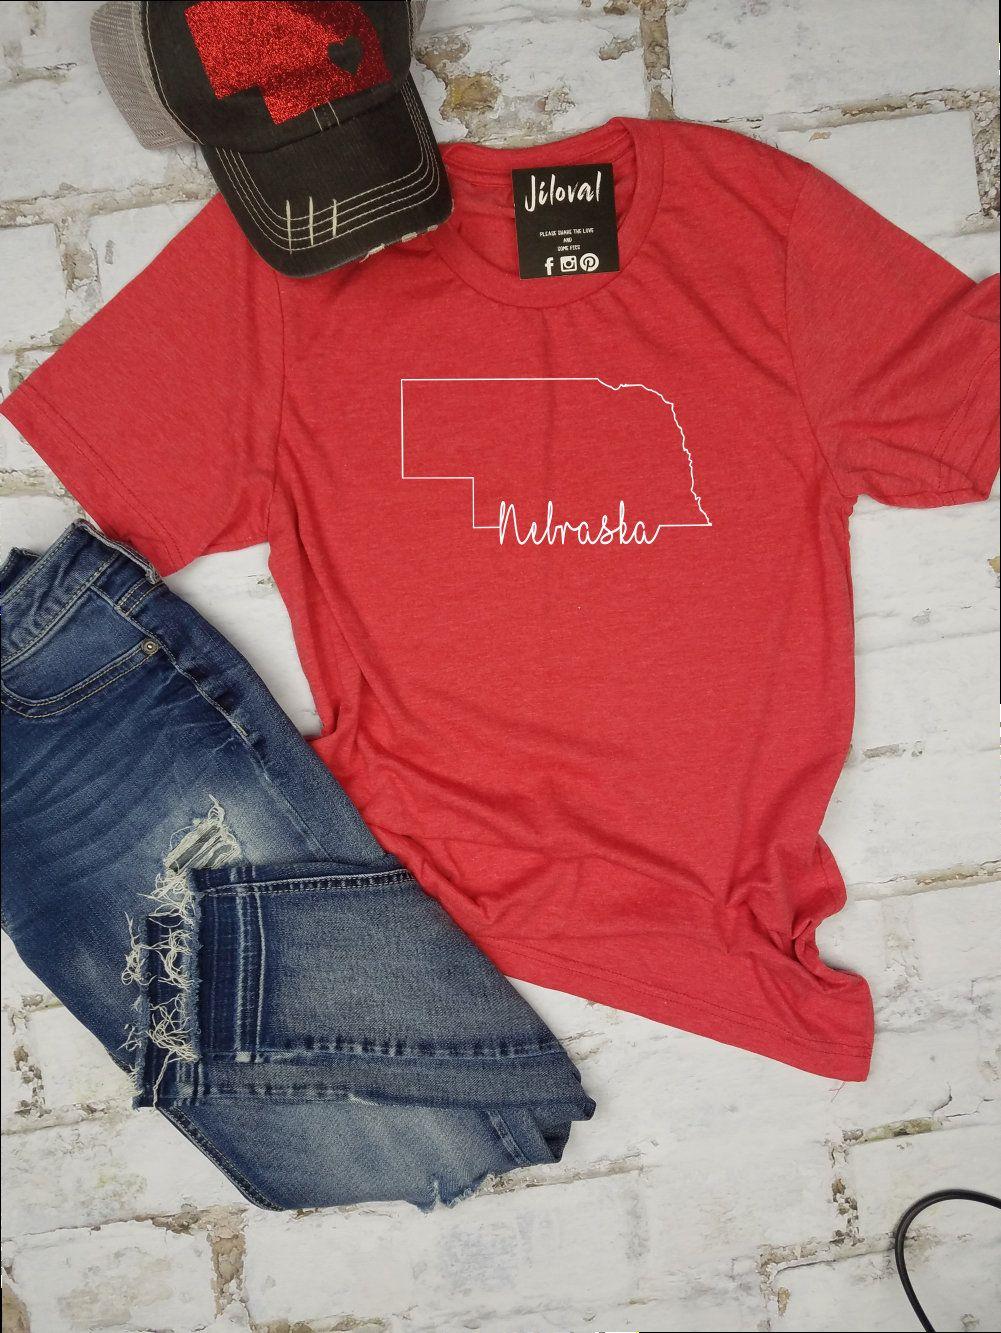 womens nebraska tee vintage new big deal cute cornhusker state funny t shirt